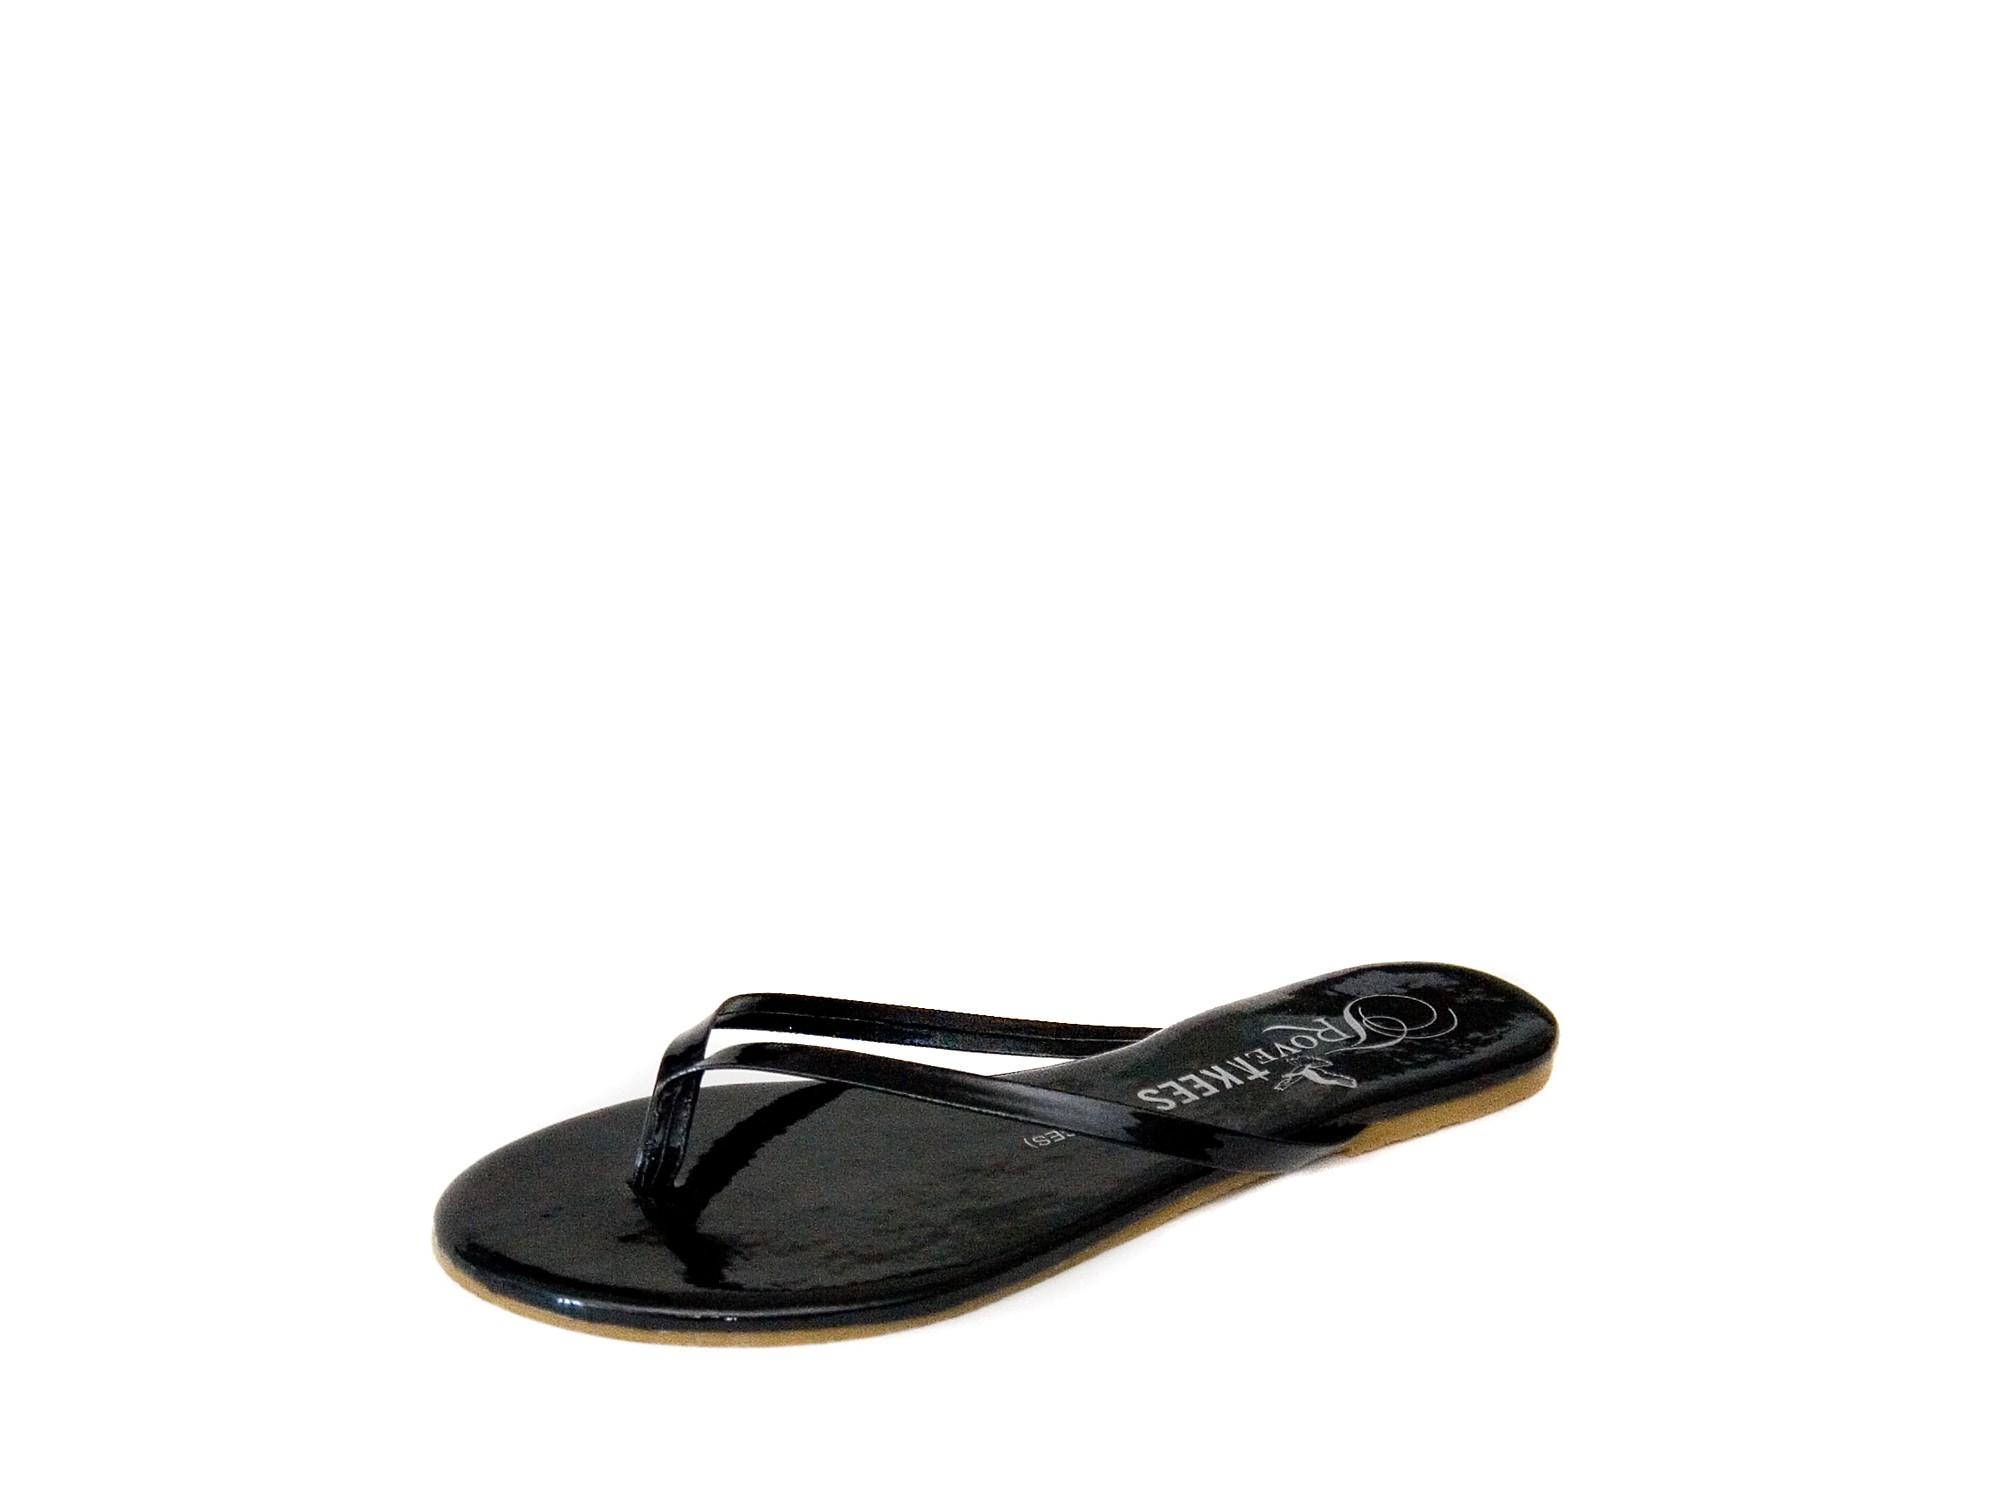 City Classified Newton Basic Thongs Flip Flops City Classified Shoes Women Gold Medallion Flat Summer Sandals Black Patent Walmart $ Shop Pretty Girl Women's Basic Patent Flat Thong Sandal Simple Thong Slip On Summe.